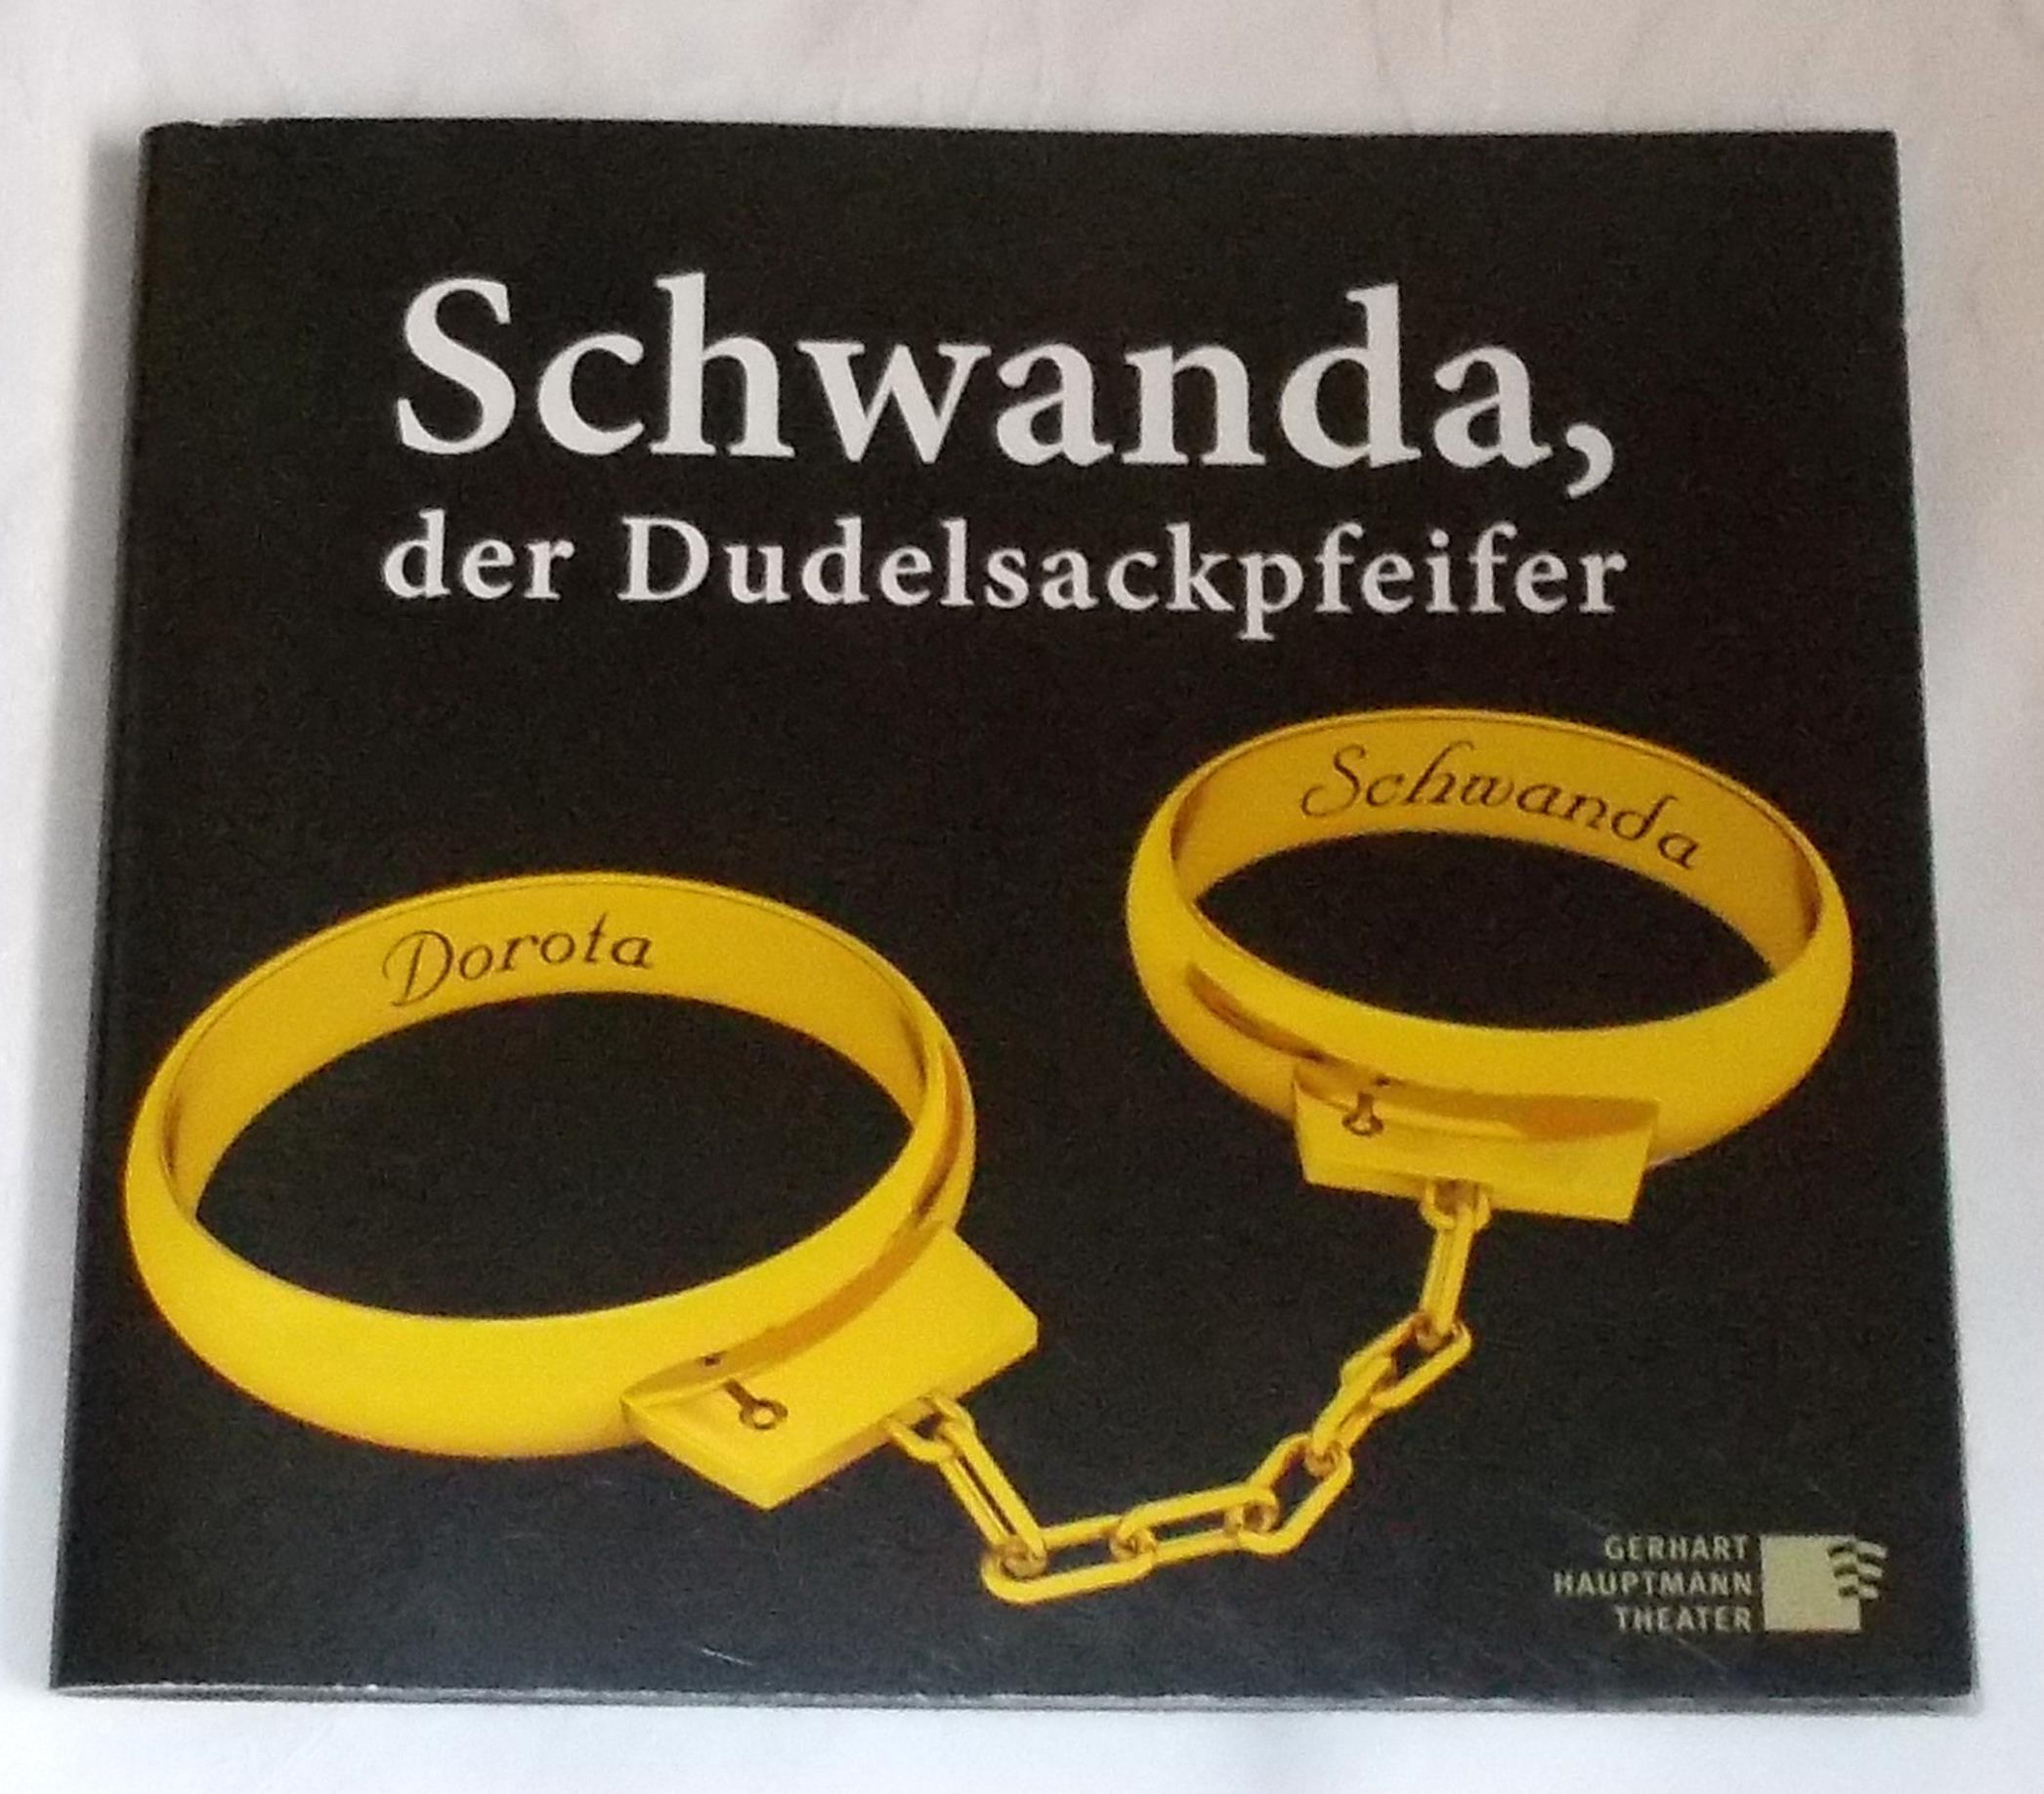 Programmheft Schwanda der Dudelsackpfeiffer. Görlitz 2011